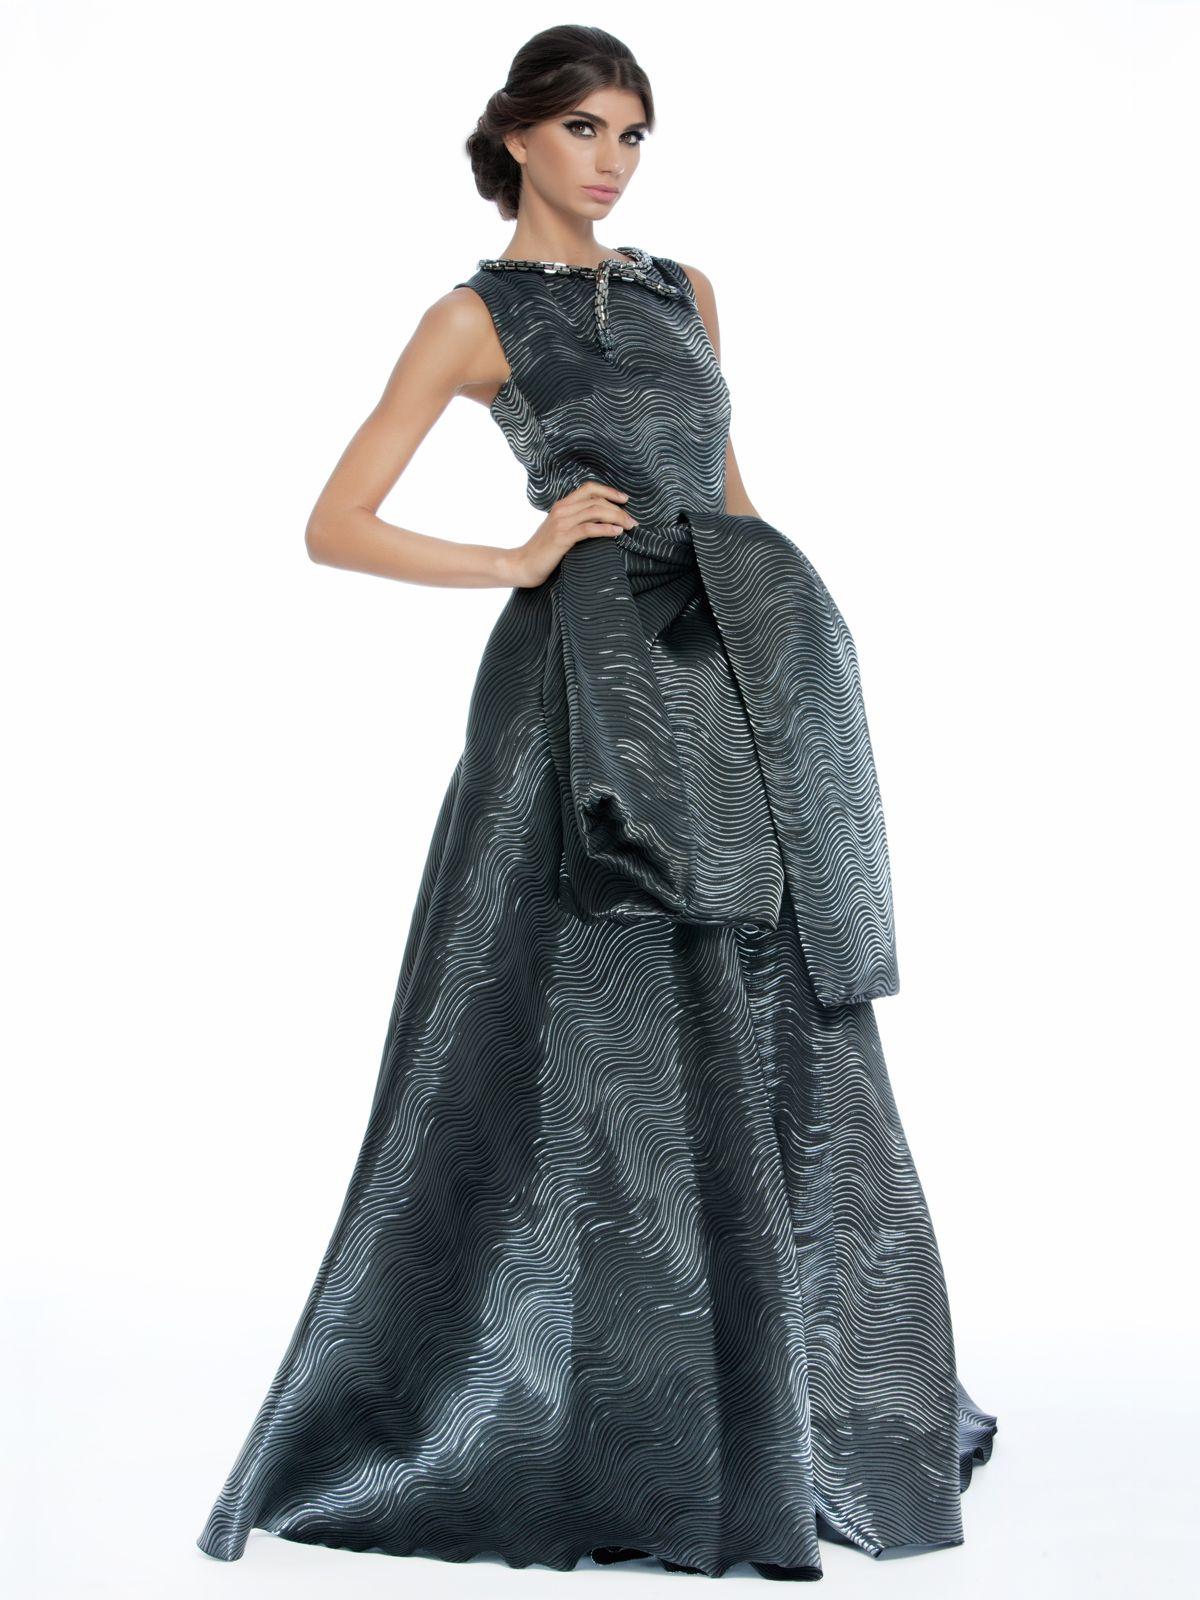 ISABEL SANCHIS ROVIGIO MODEL DRESS